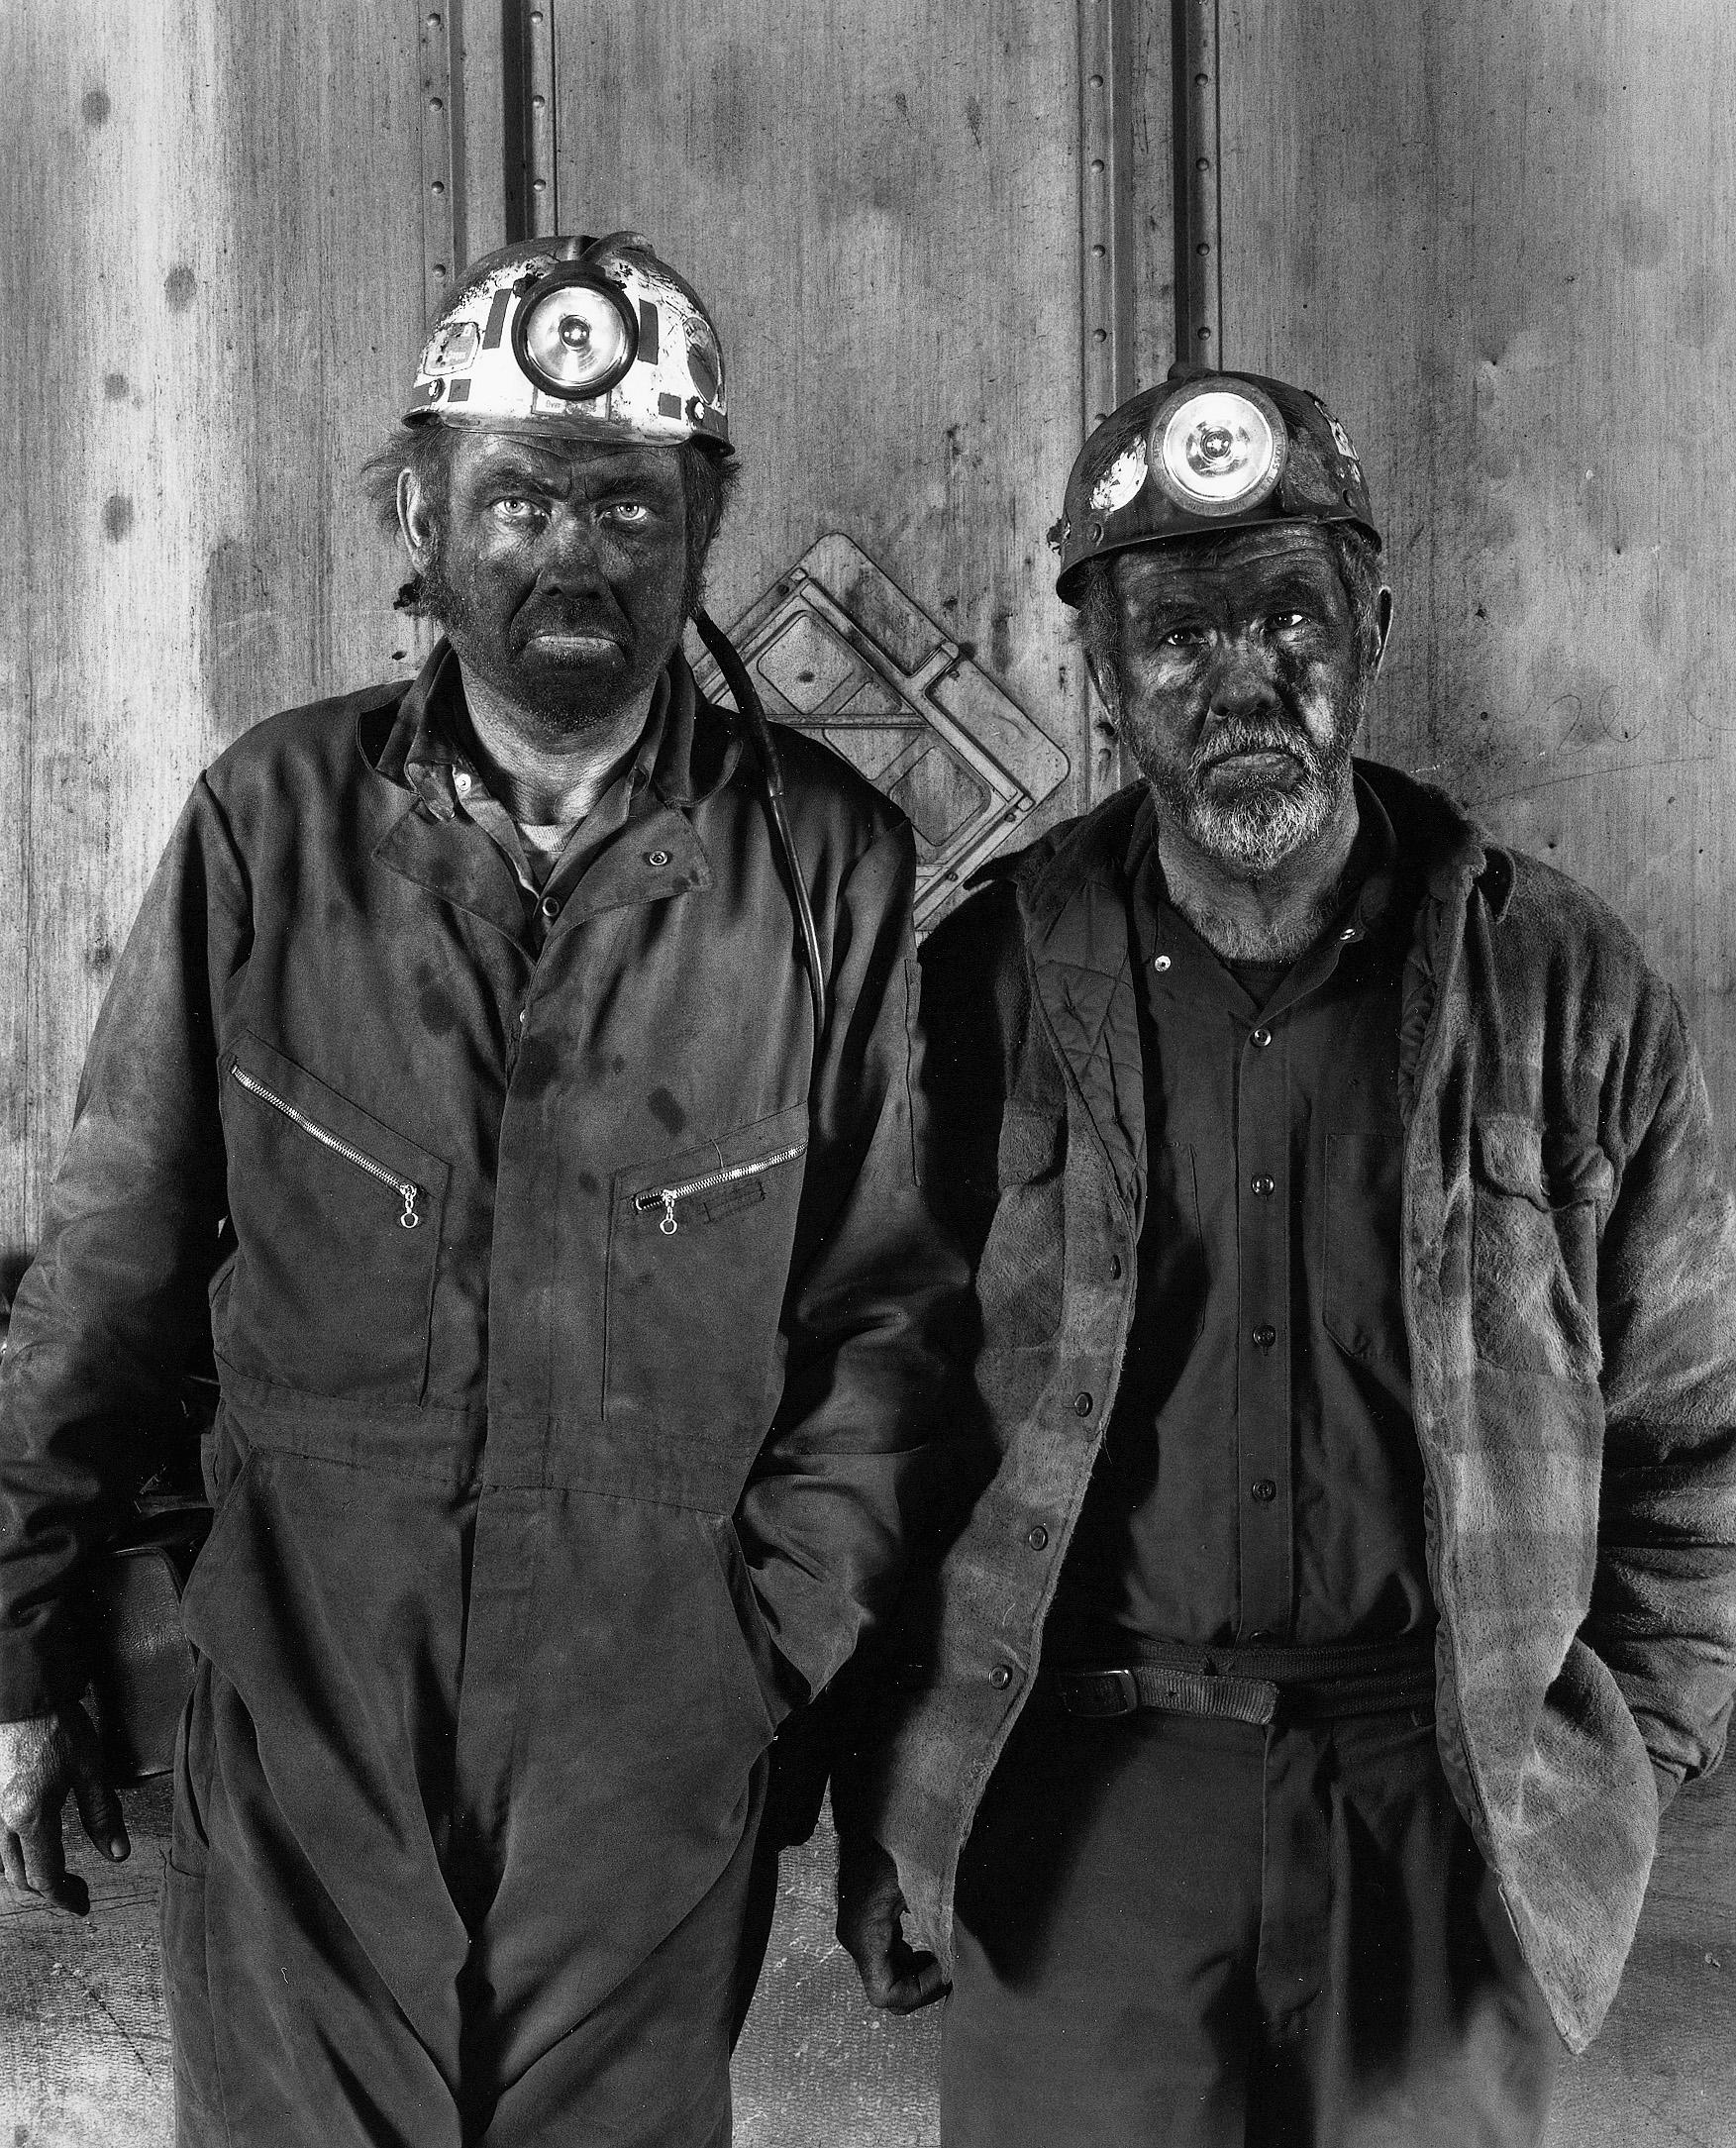 Image - Coal Miners.jpg